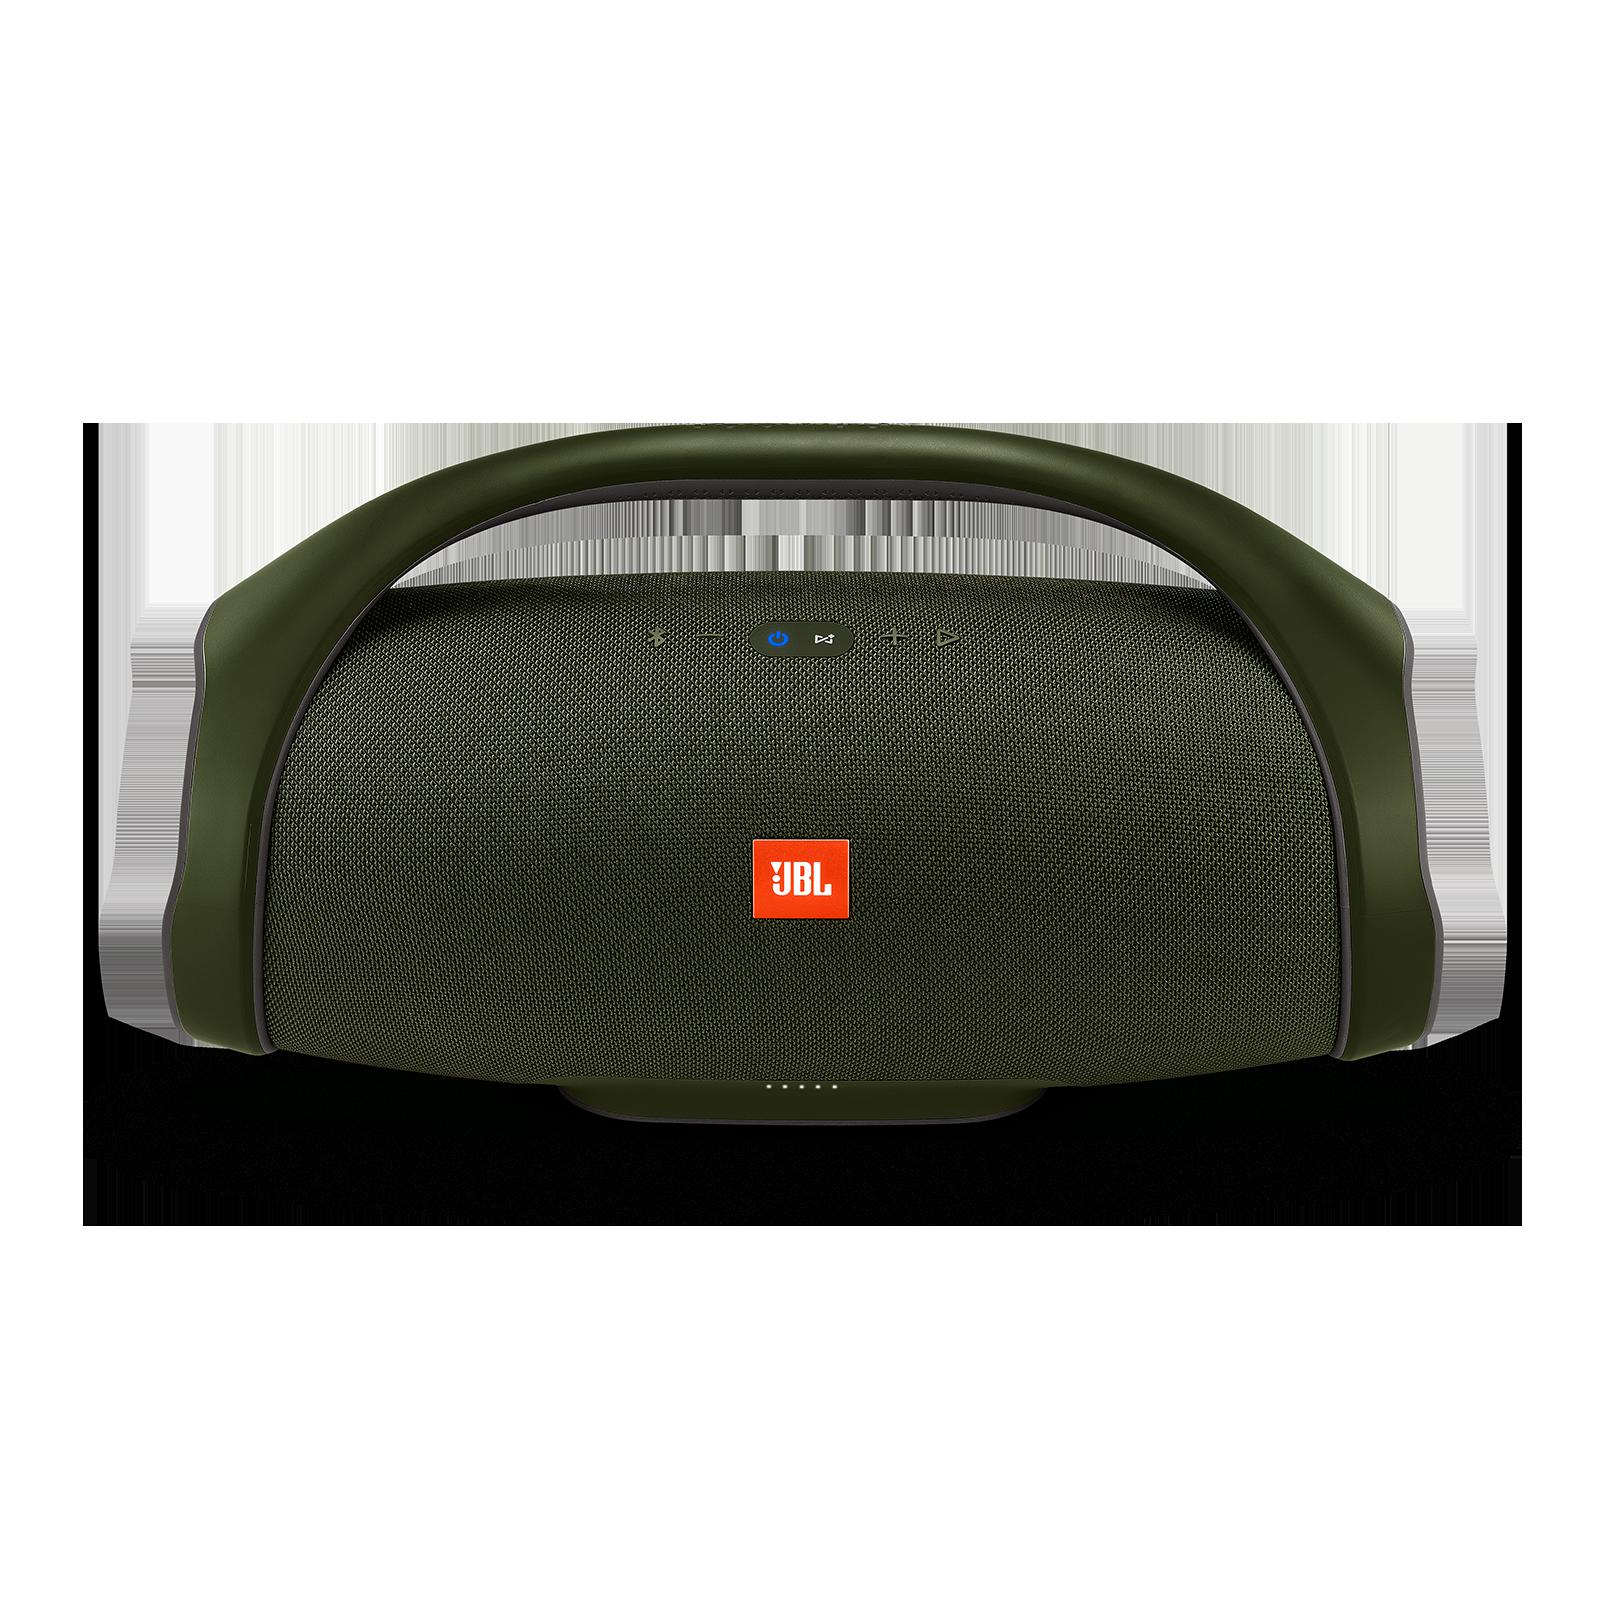 JBL Boombox Portable Bluetooth Speaker - Green (BOOMBOX-GN)